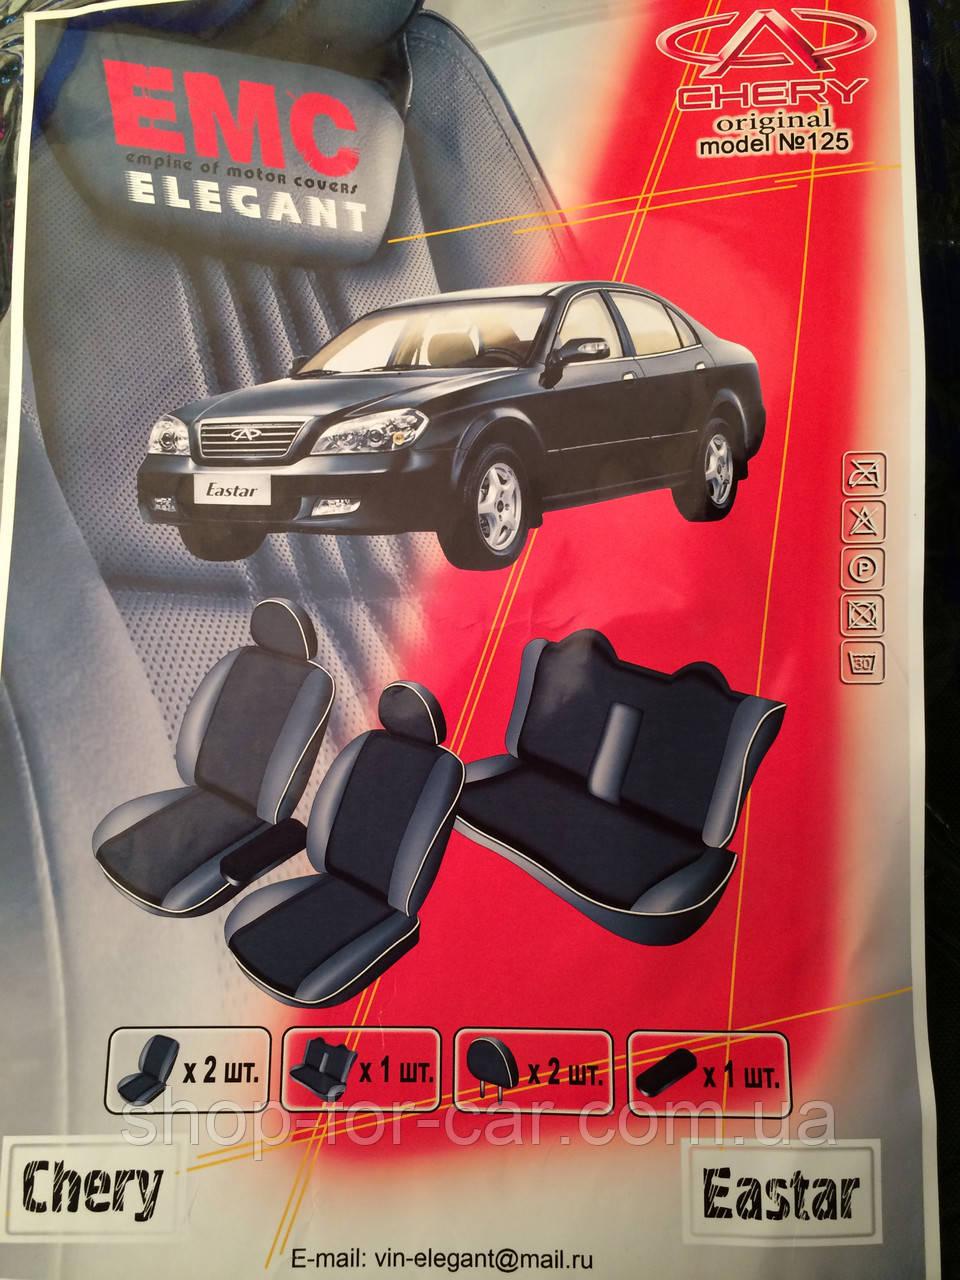 364978c3d68b Авточехлы Chery Estar EMC-ELEGANT - Интернет-магазин Iva-avto в Харькове